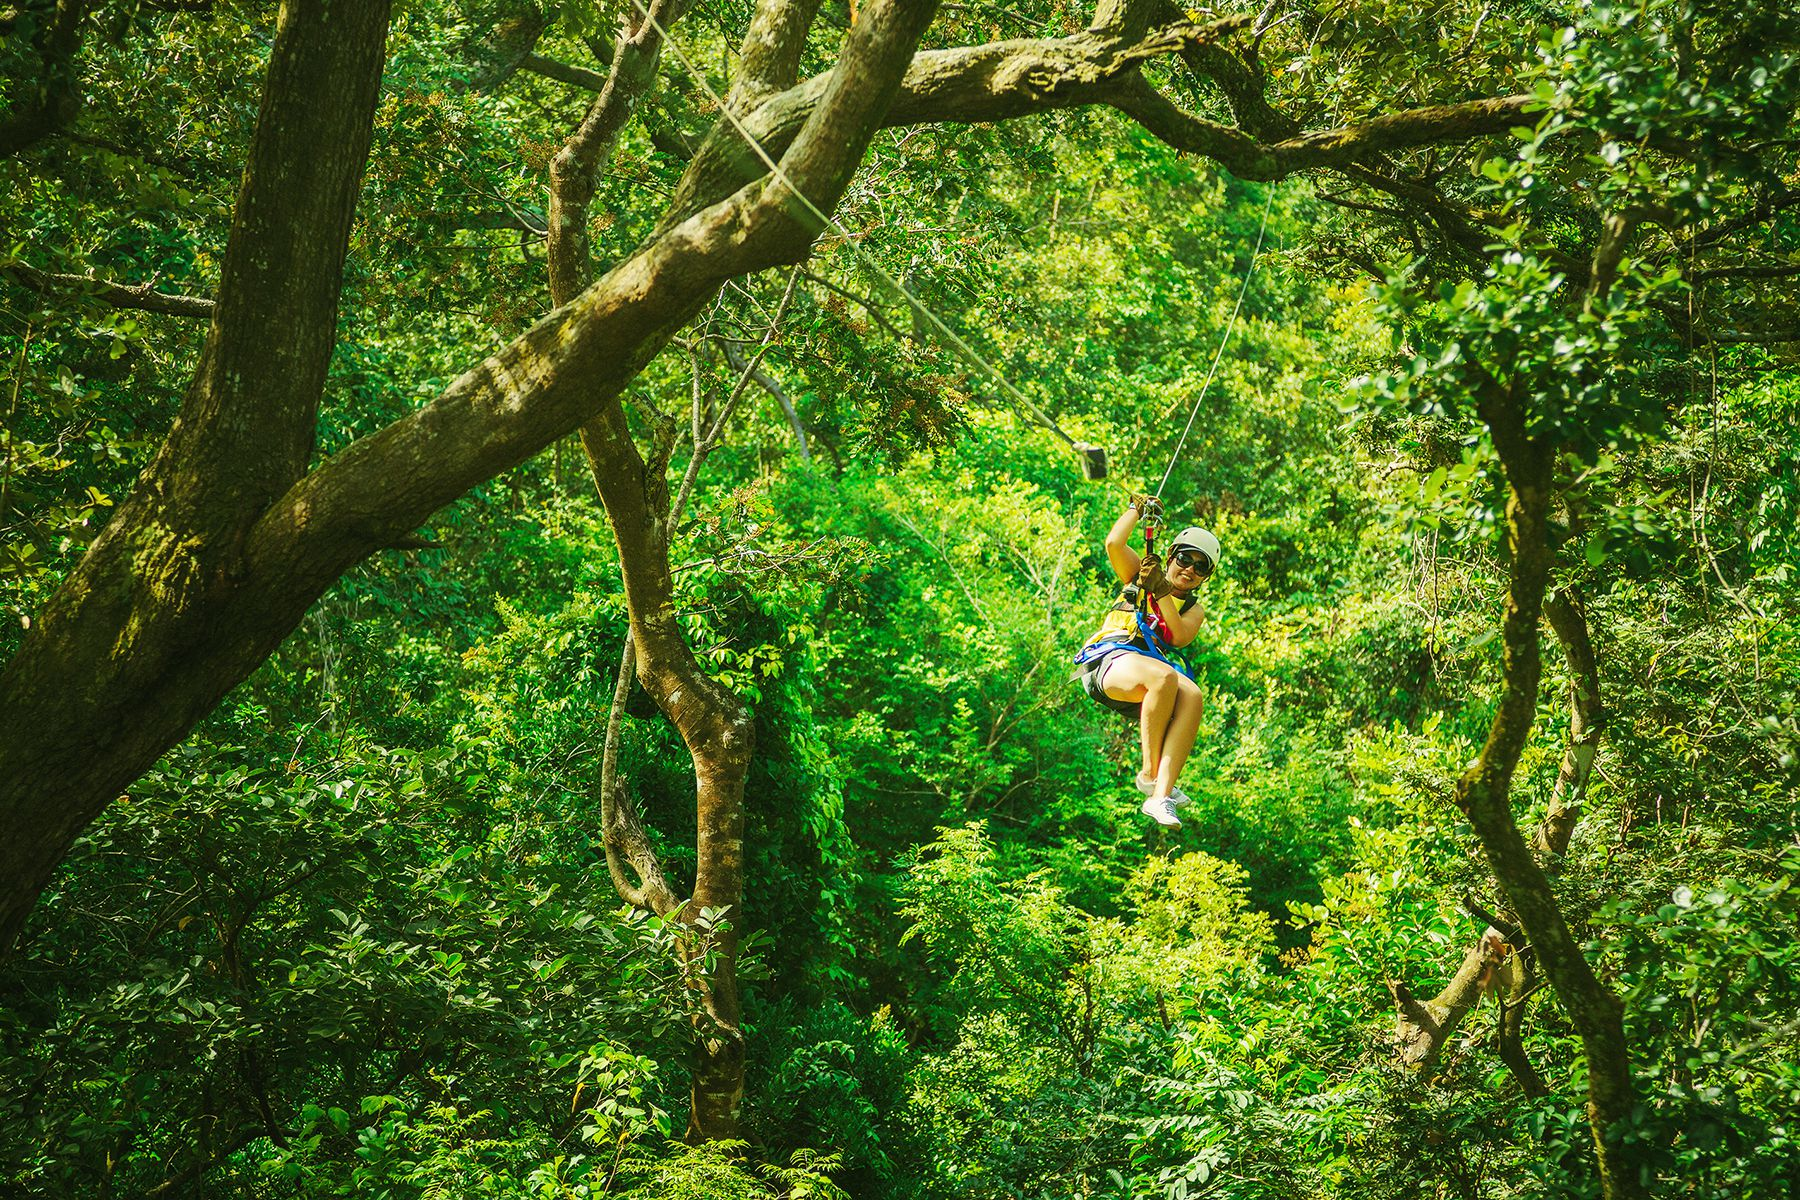 Ziplining in the Costa Rica canopy